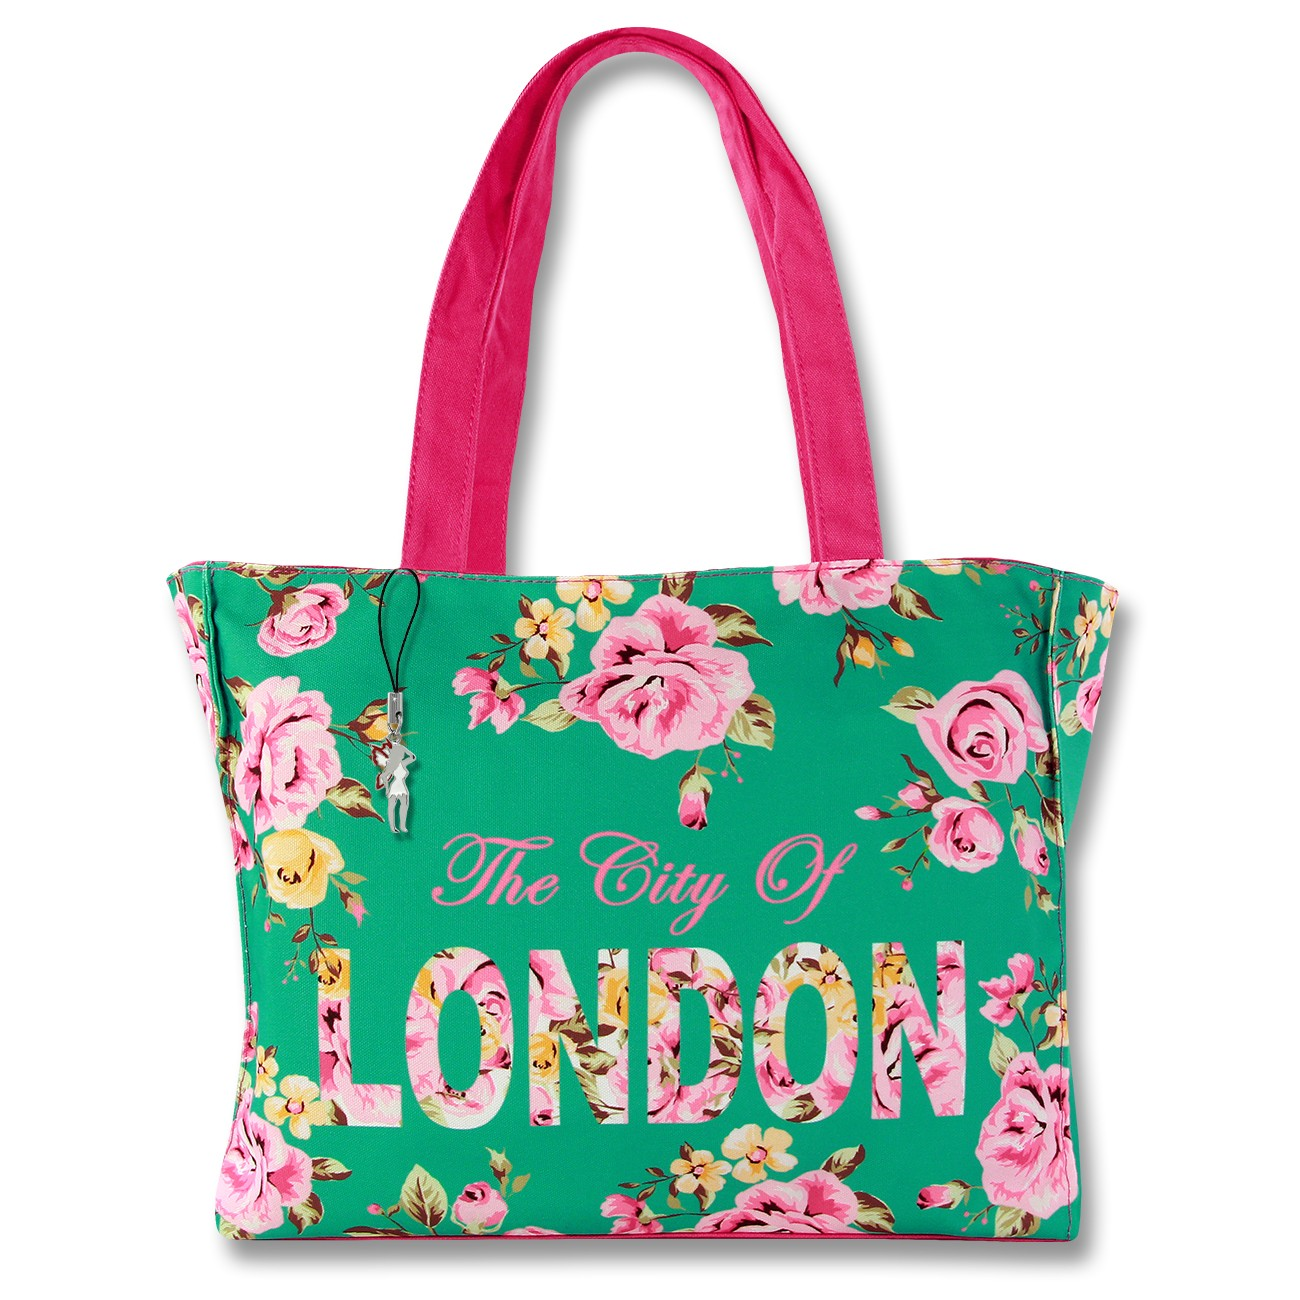 Schultertasche Henkeltasche Canvas grün pink Damen Shopper Robin Ruth OTG205G